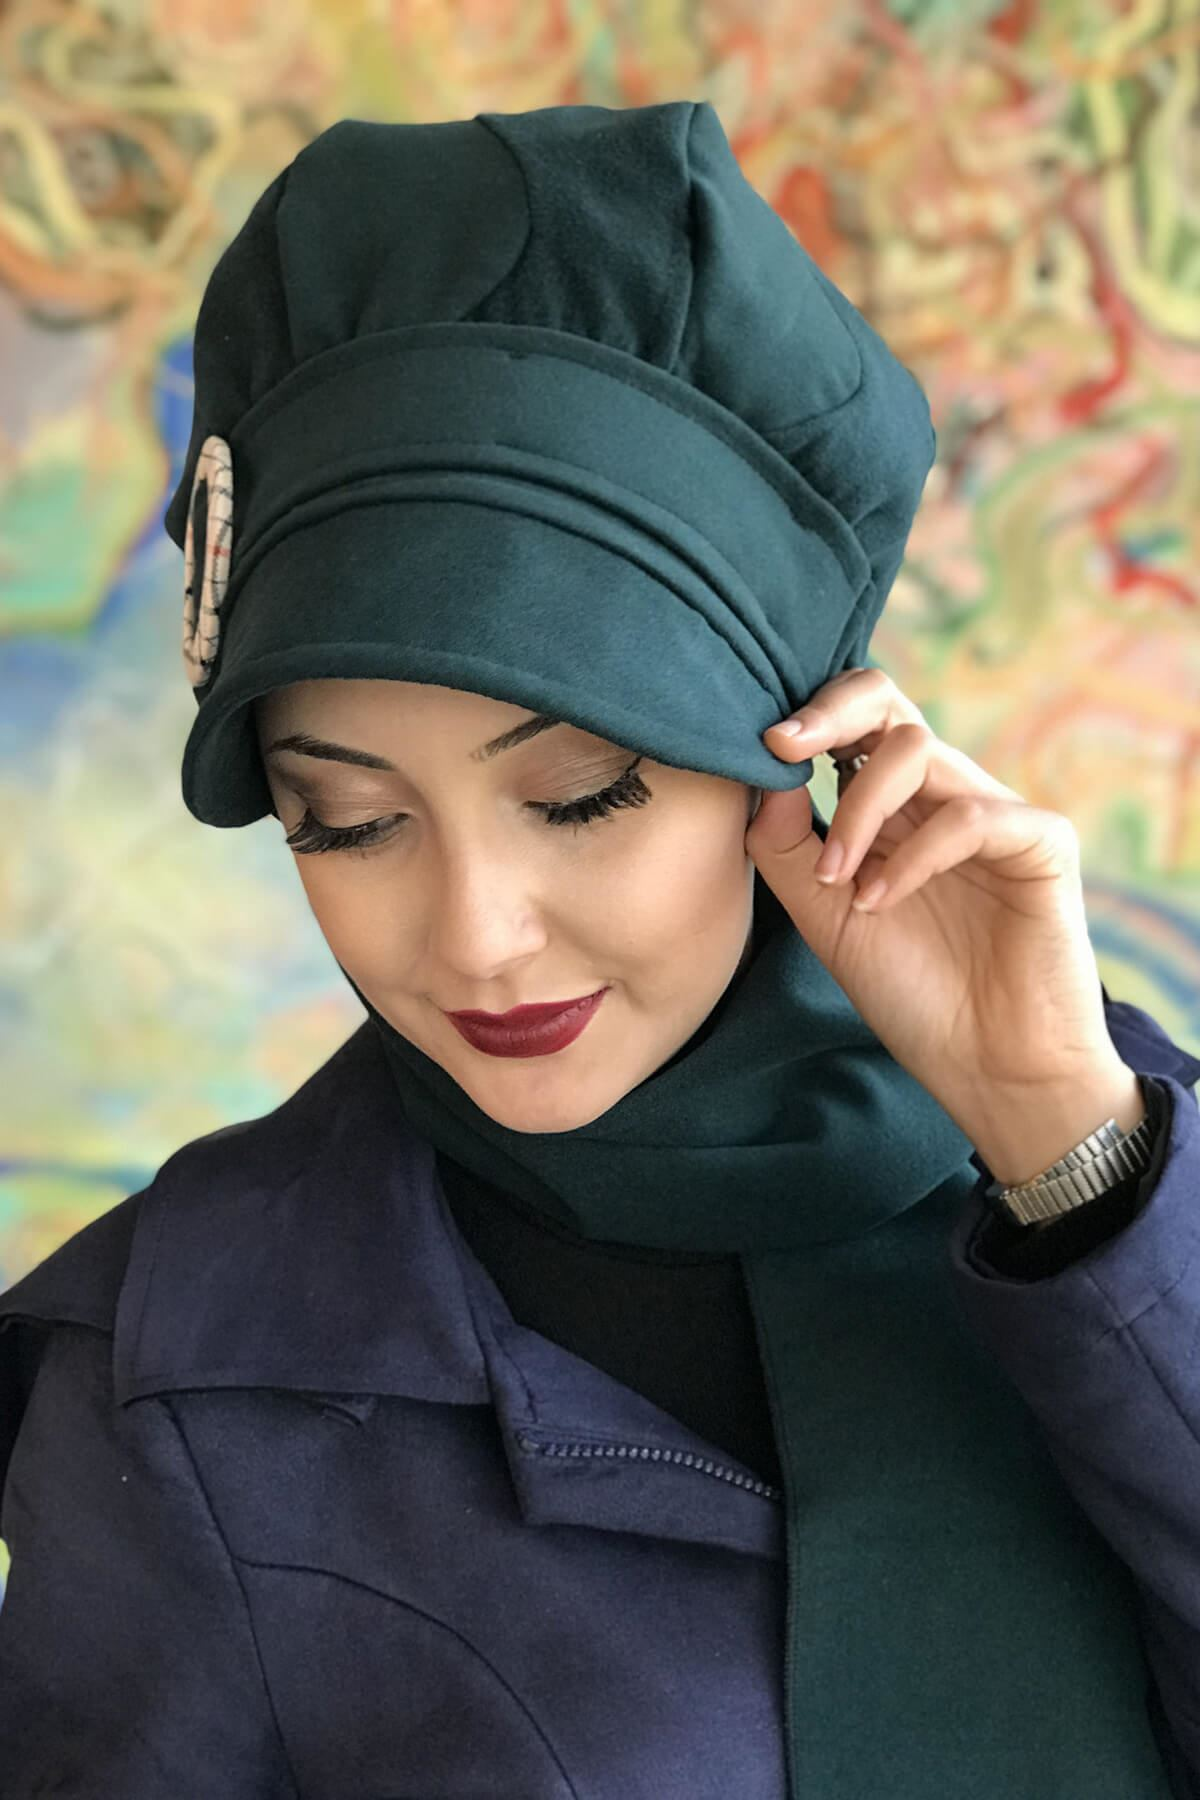 Zümrüt Yeşili Renkli Yuvarlak Tokalı Şapka Şal Elif Model